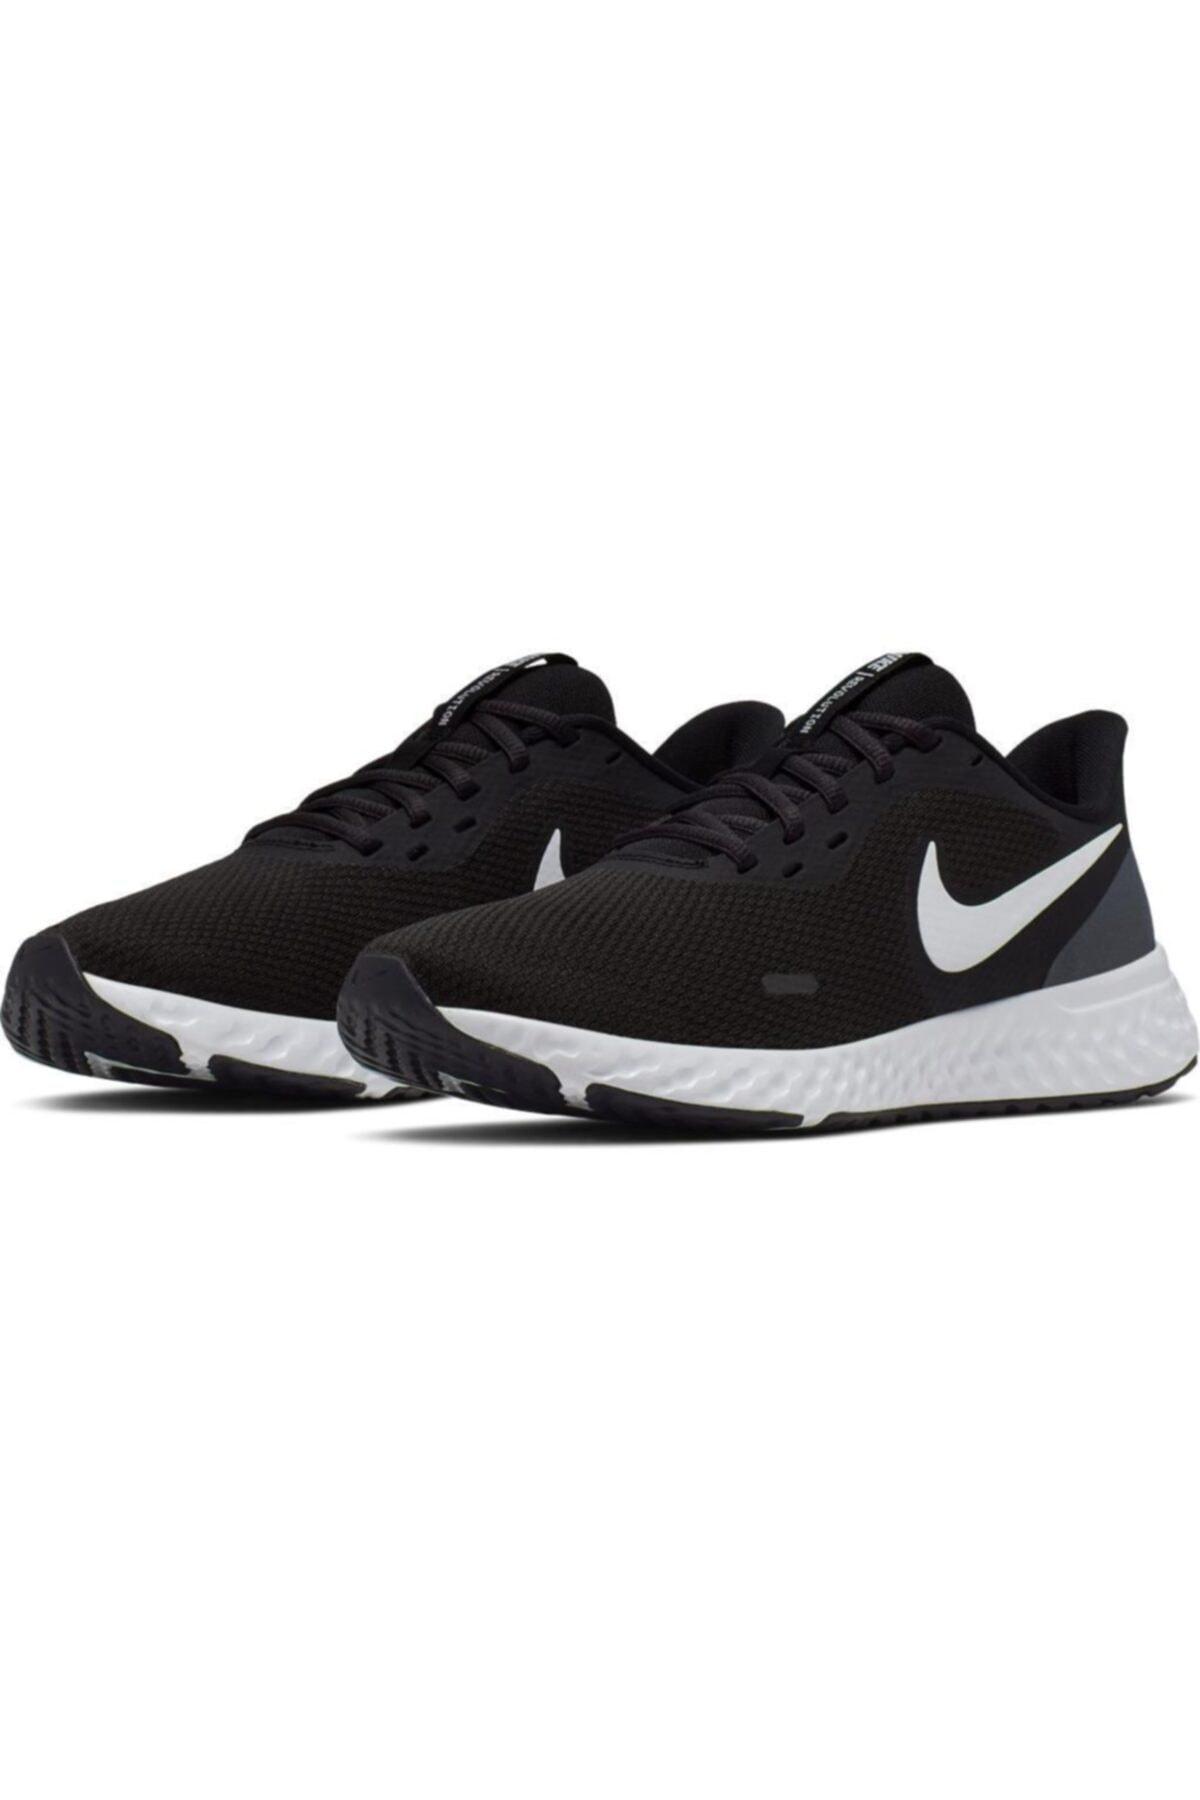 Nike Bq3207-002 Wmns Revolution 5 Kadın Spor Ayakkabı 2